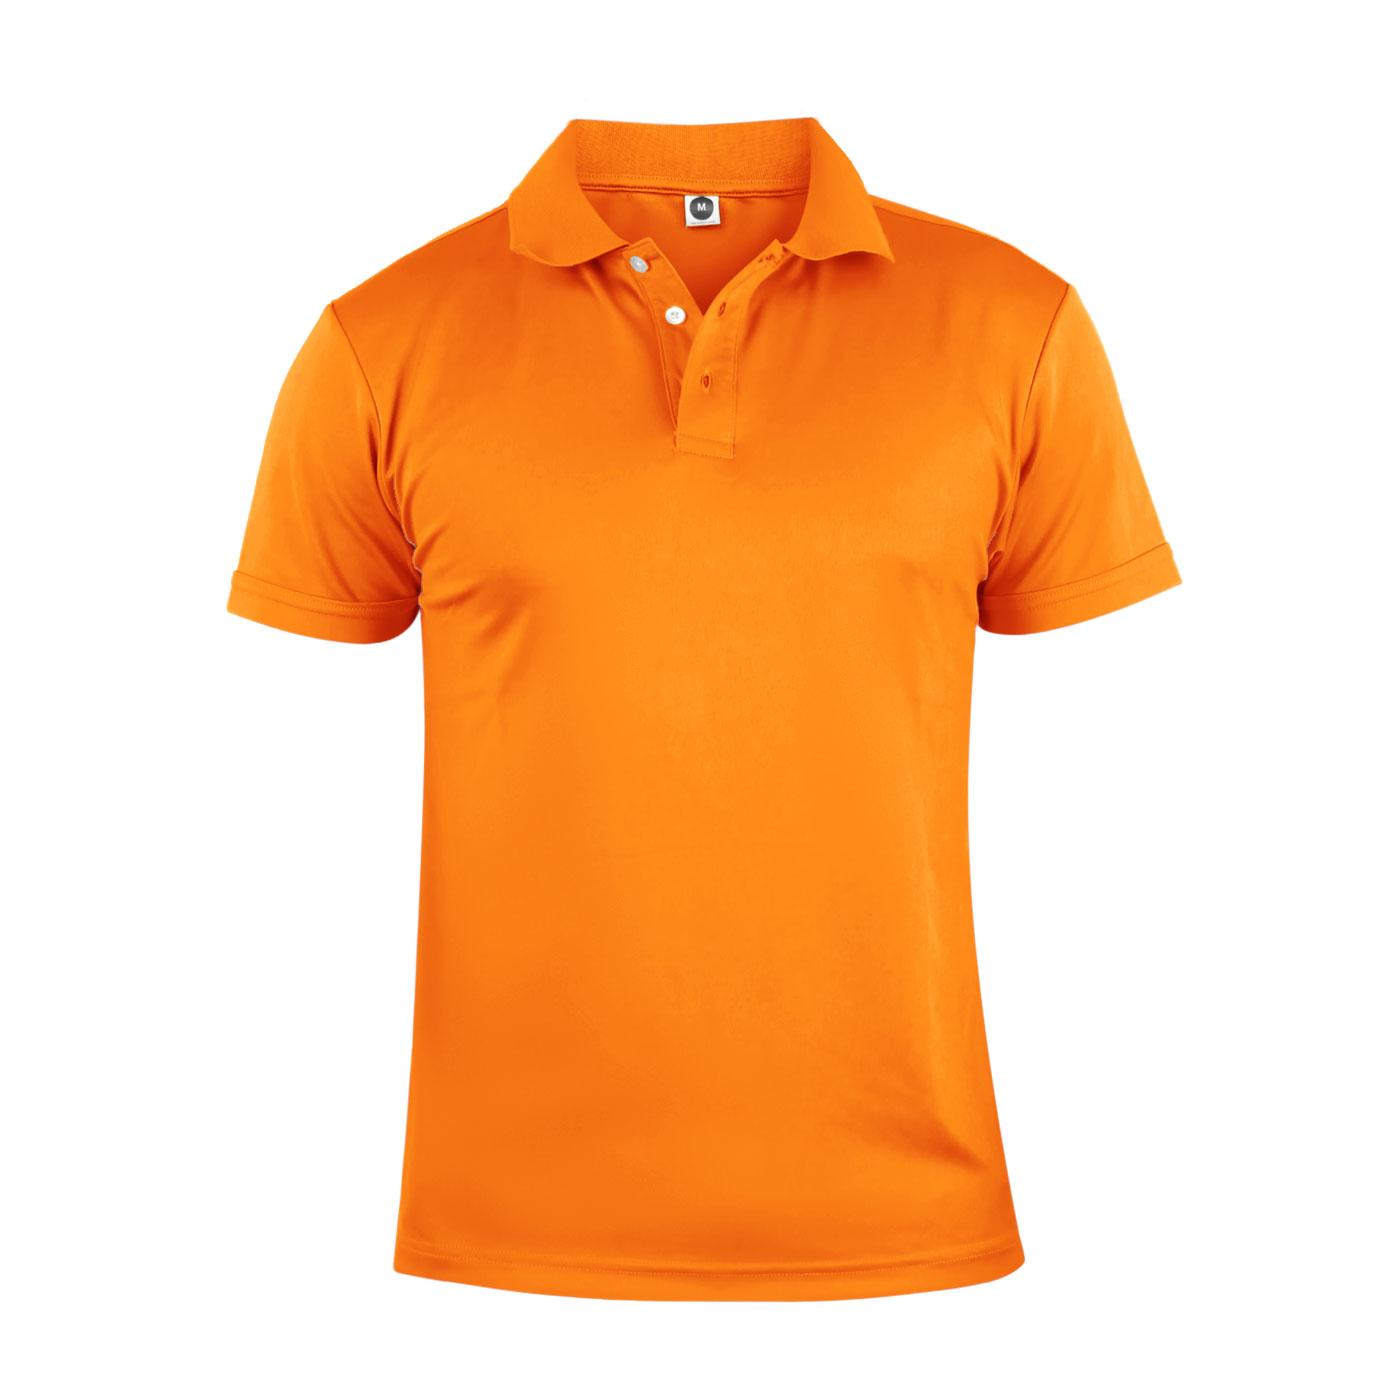 HODARLA 彈力涼感短袖POLO衫 3113901 - 橘